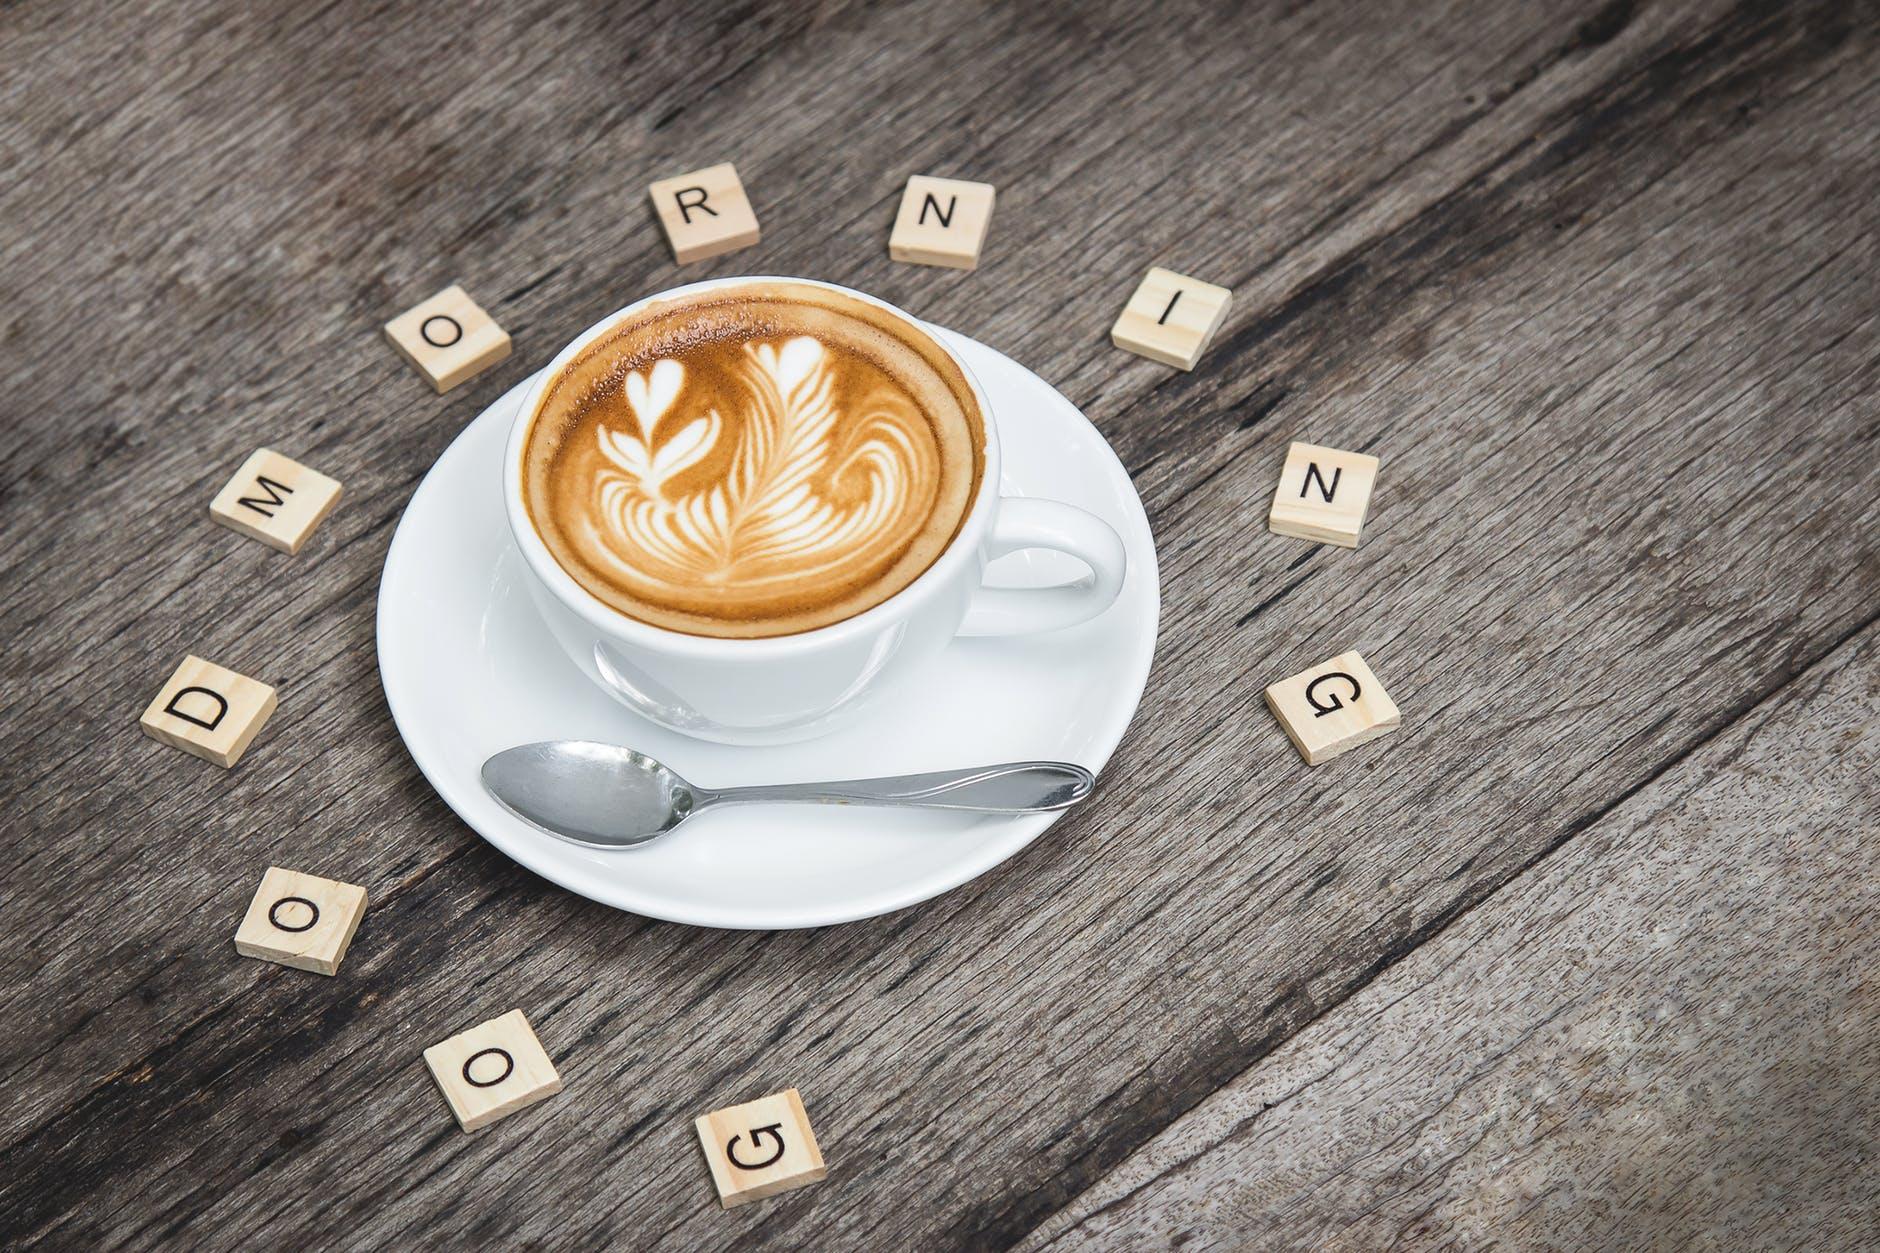 cafe caffeine cappuccino close up